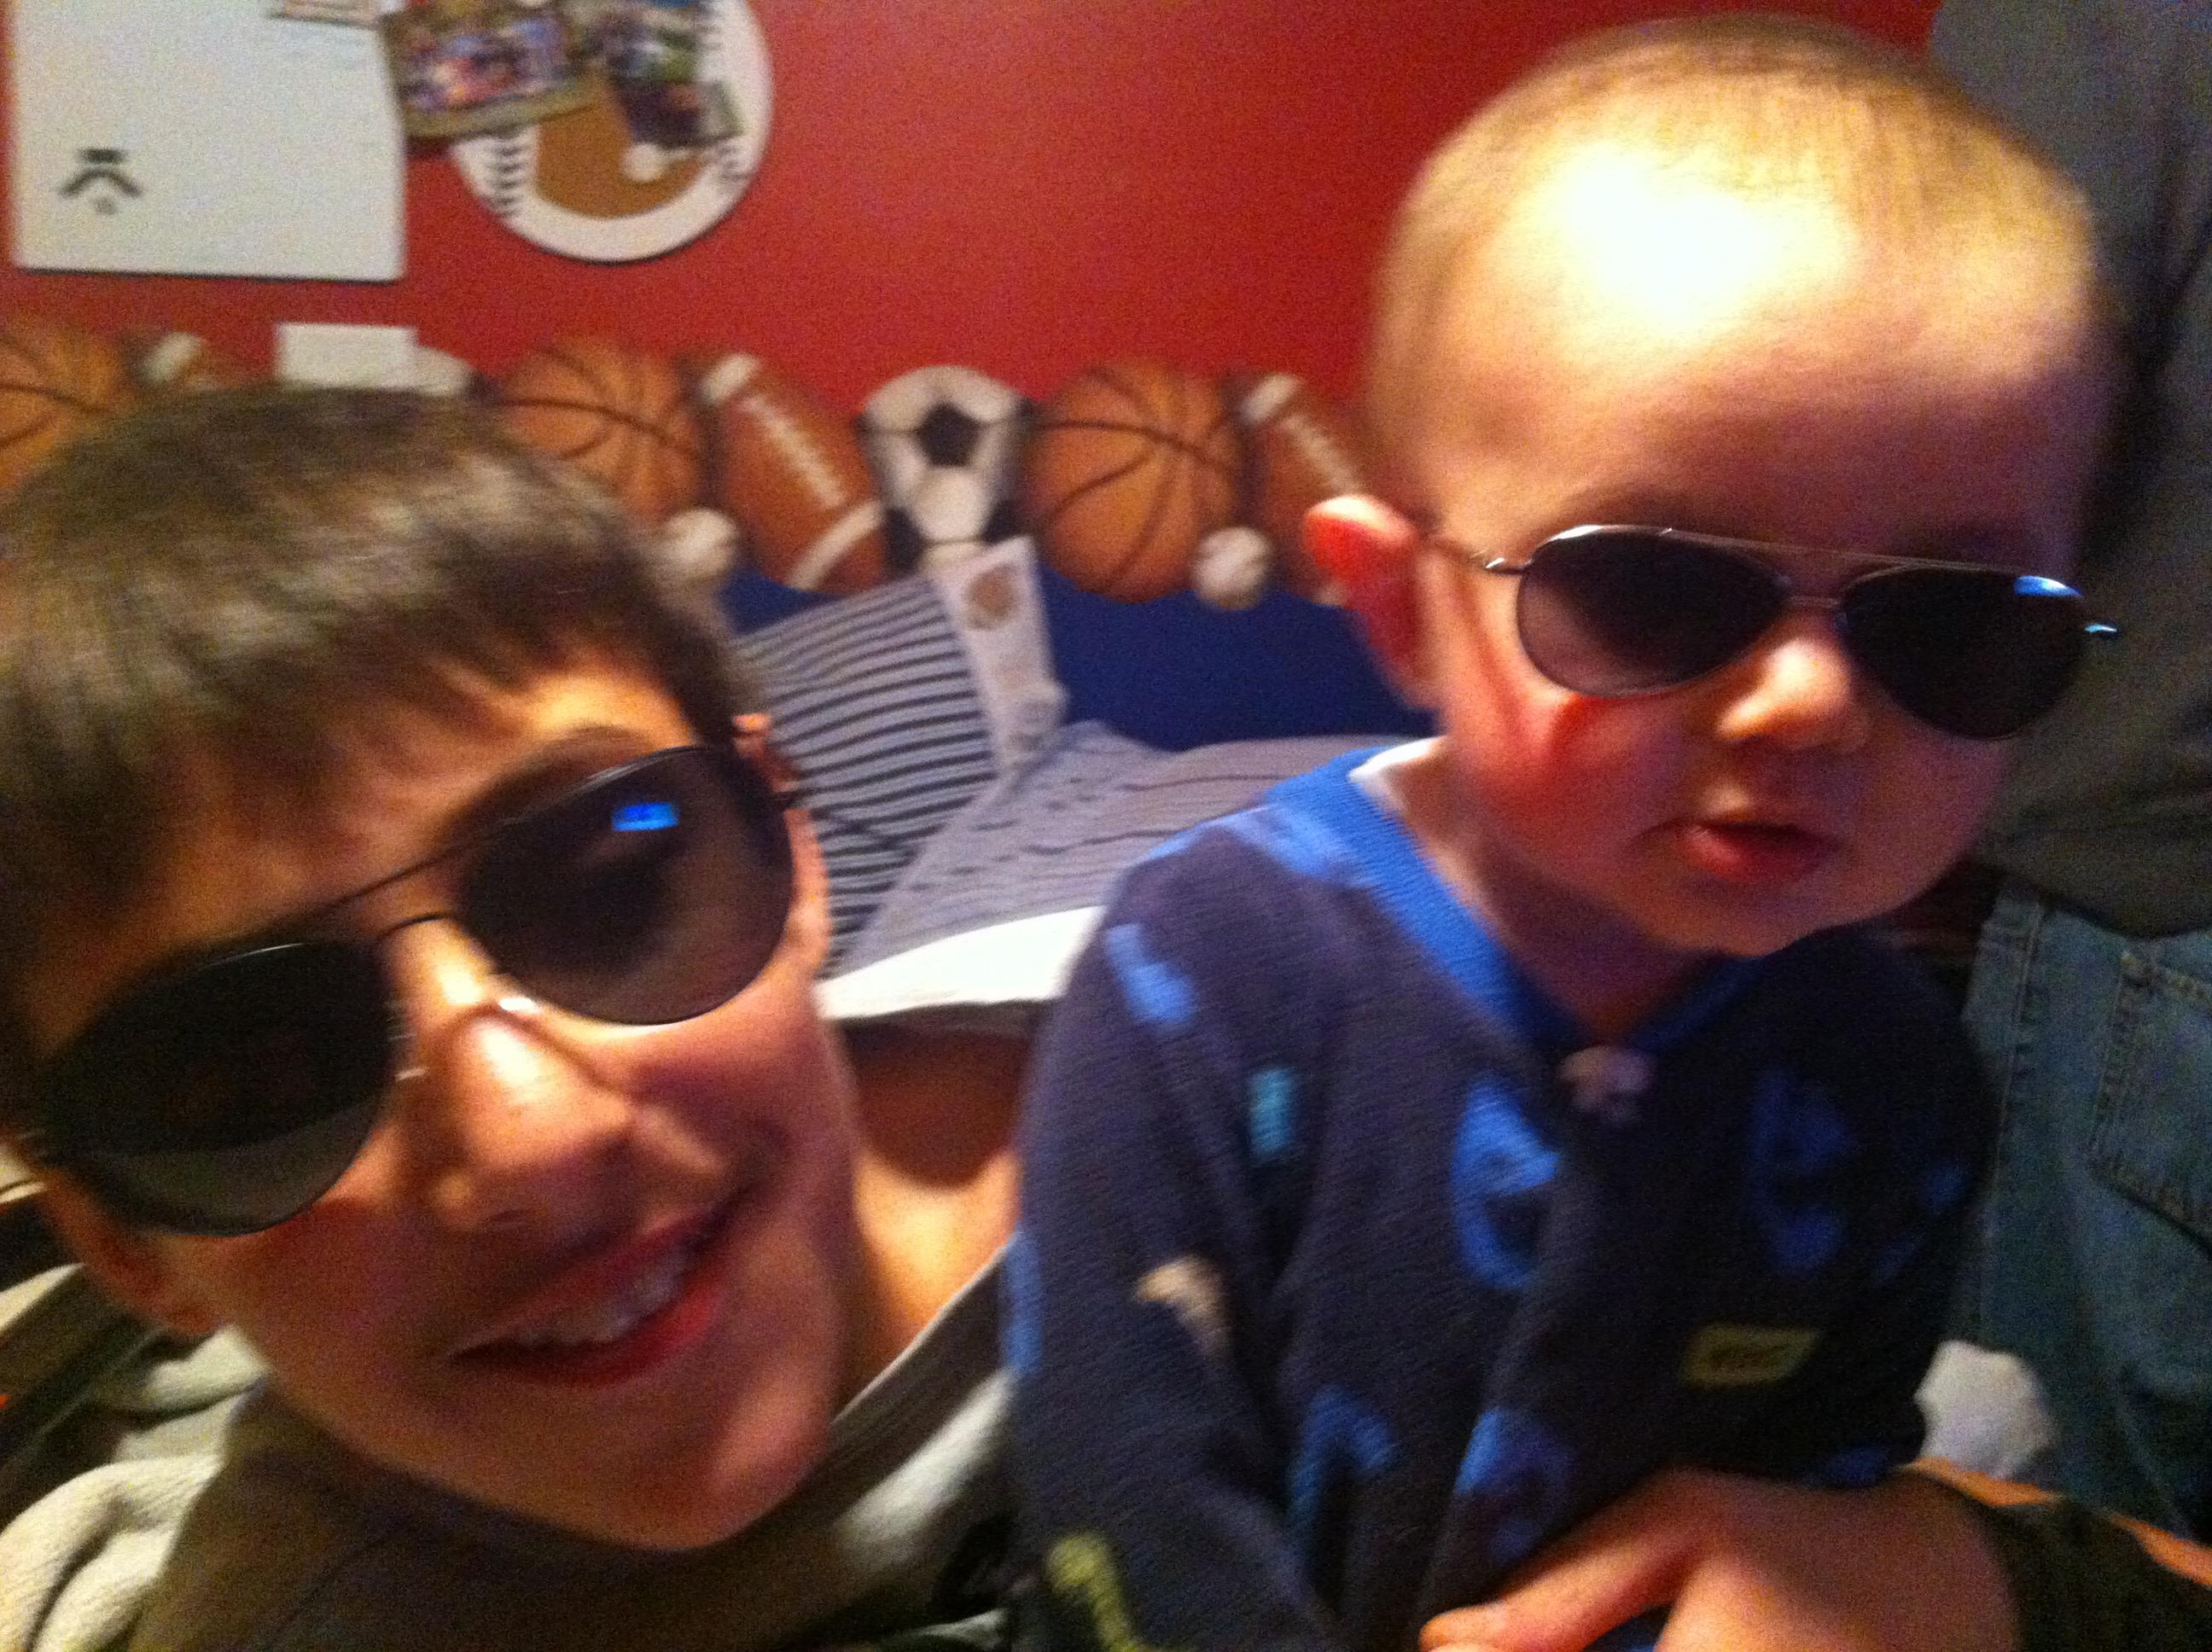 Sawyer Johnny brothers rockstars glasses